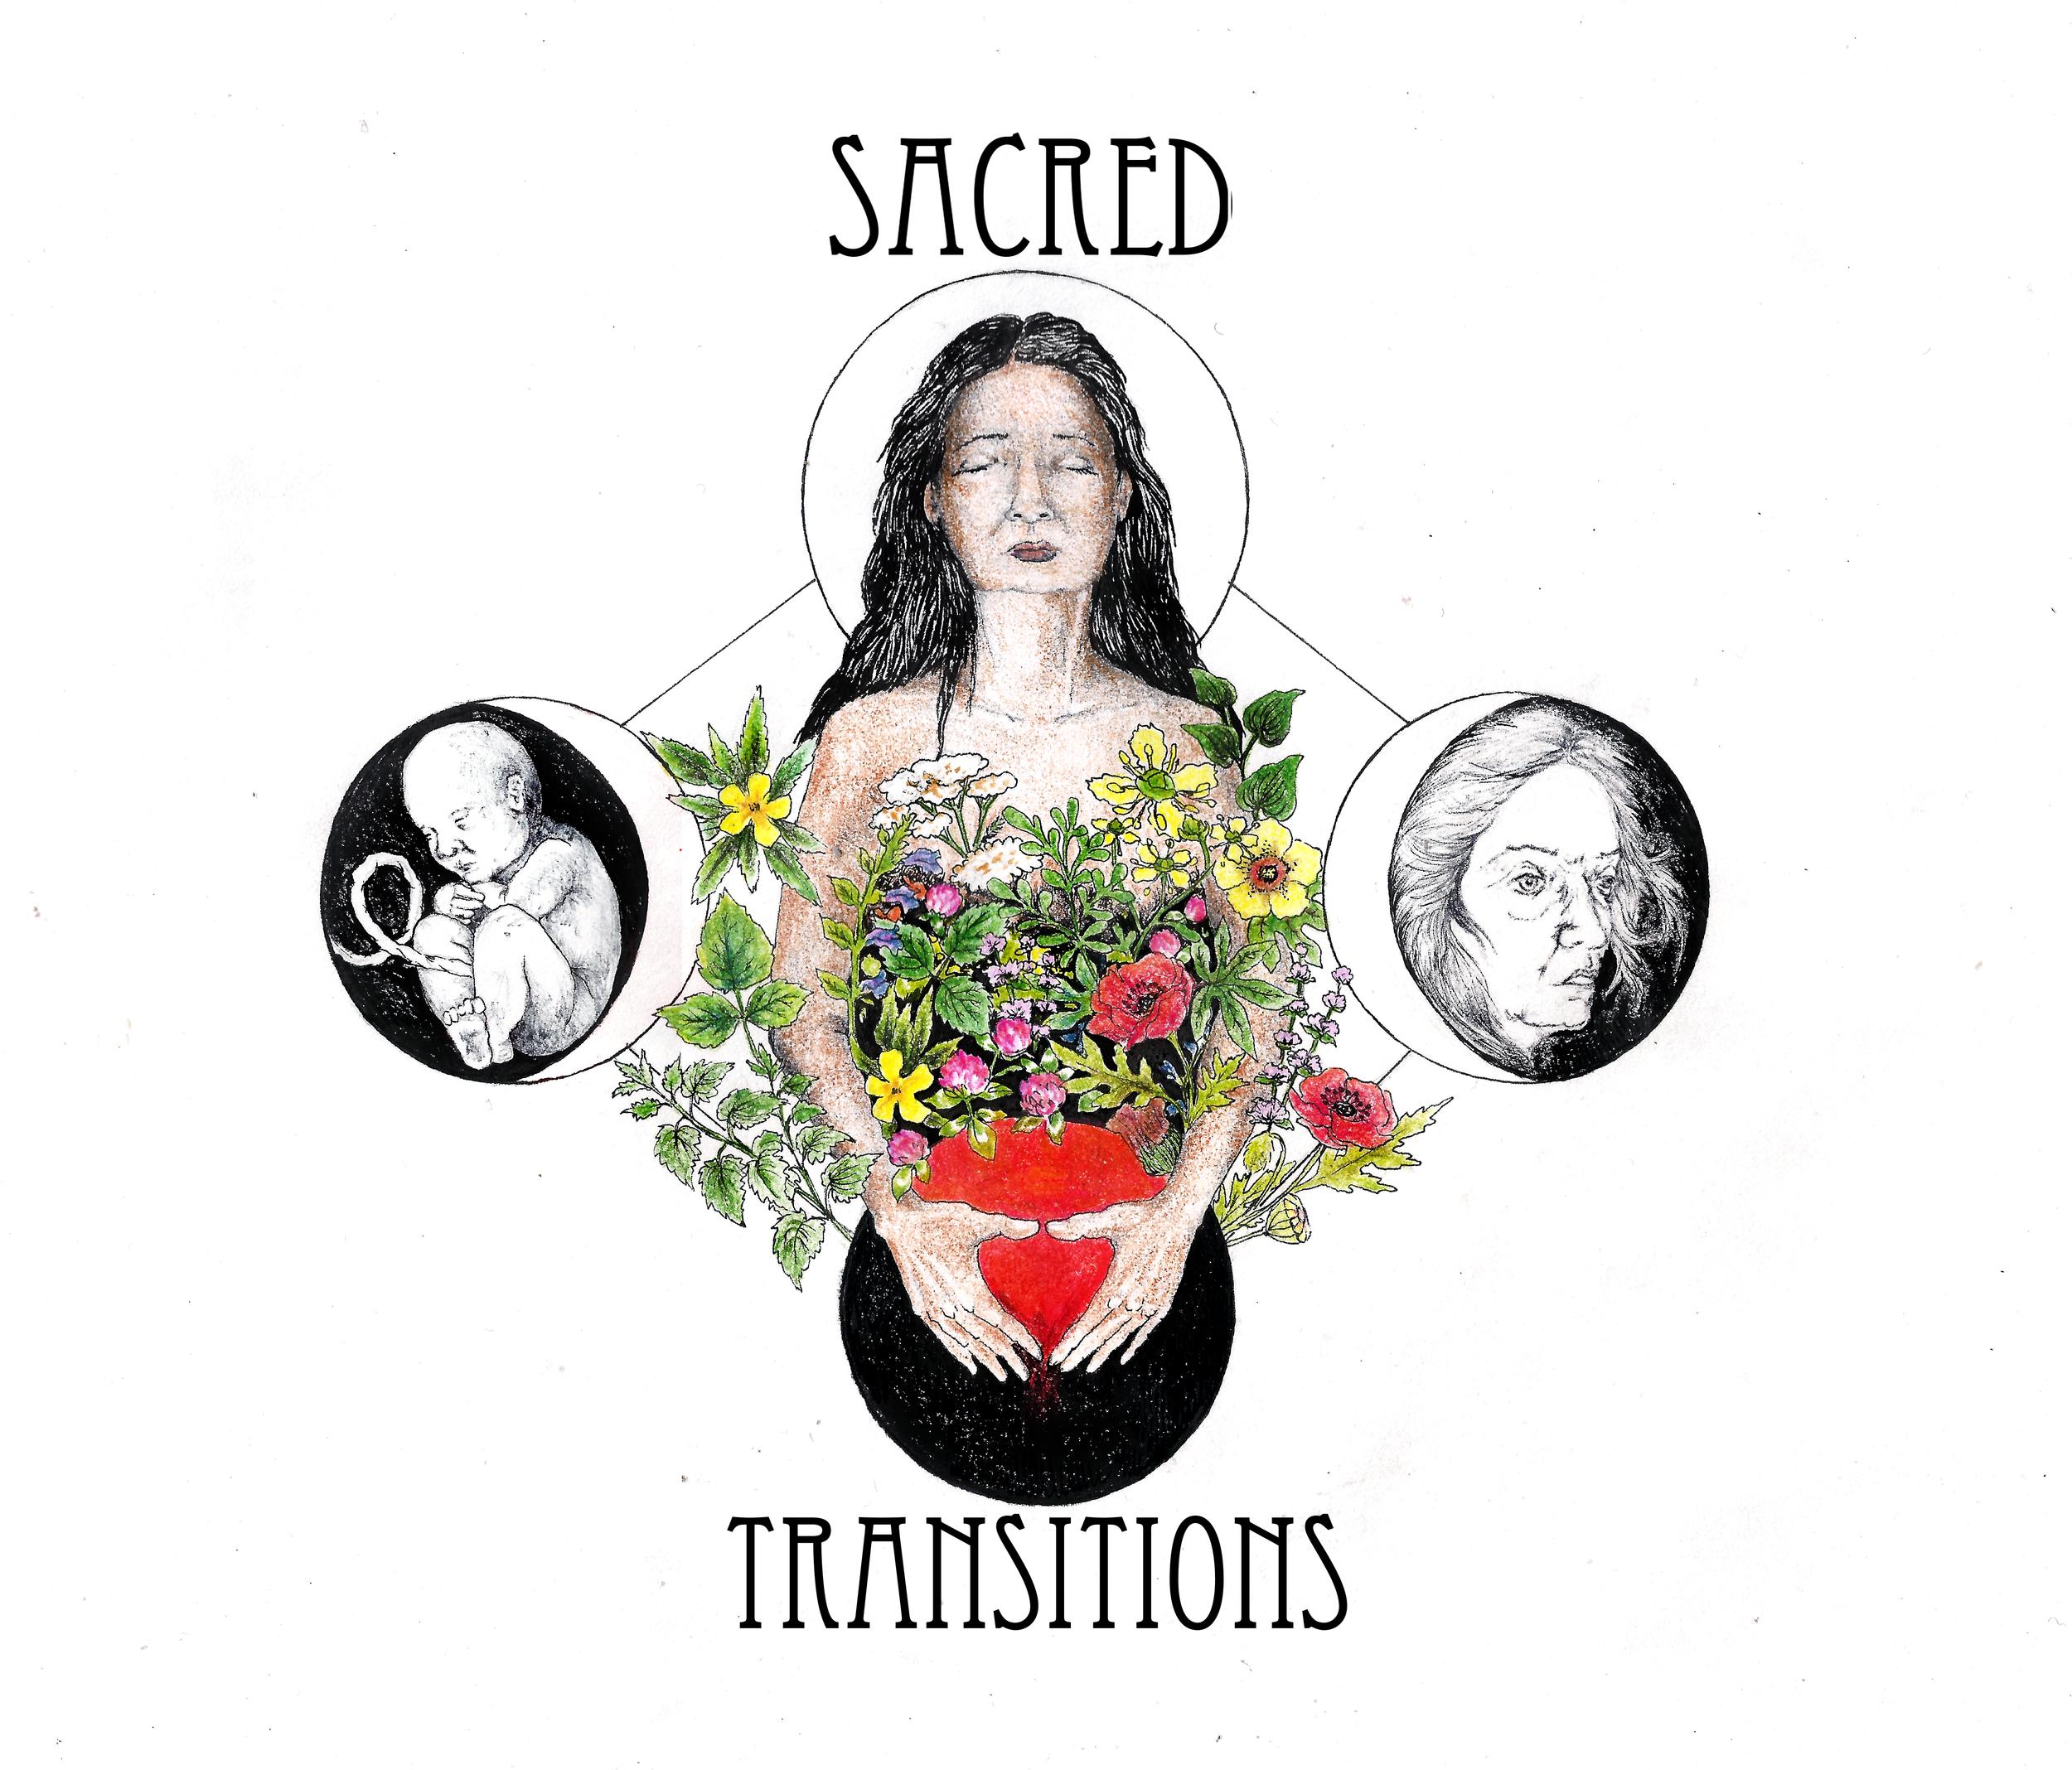 sacredtransitions1.png